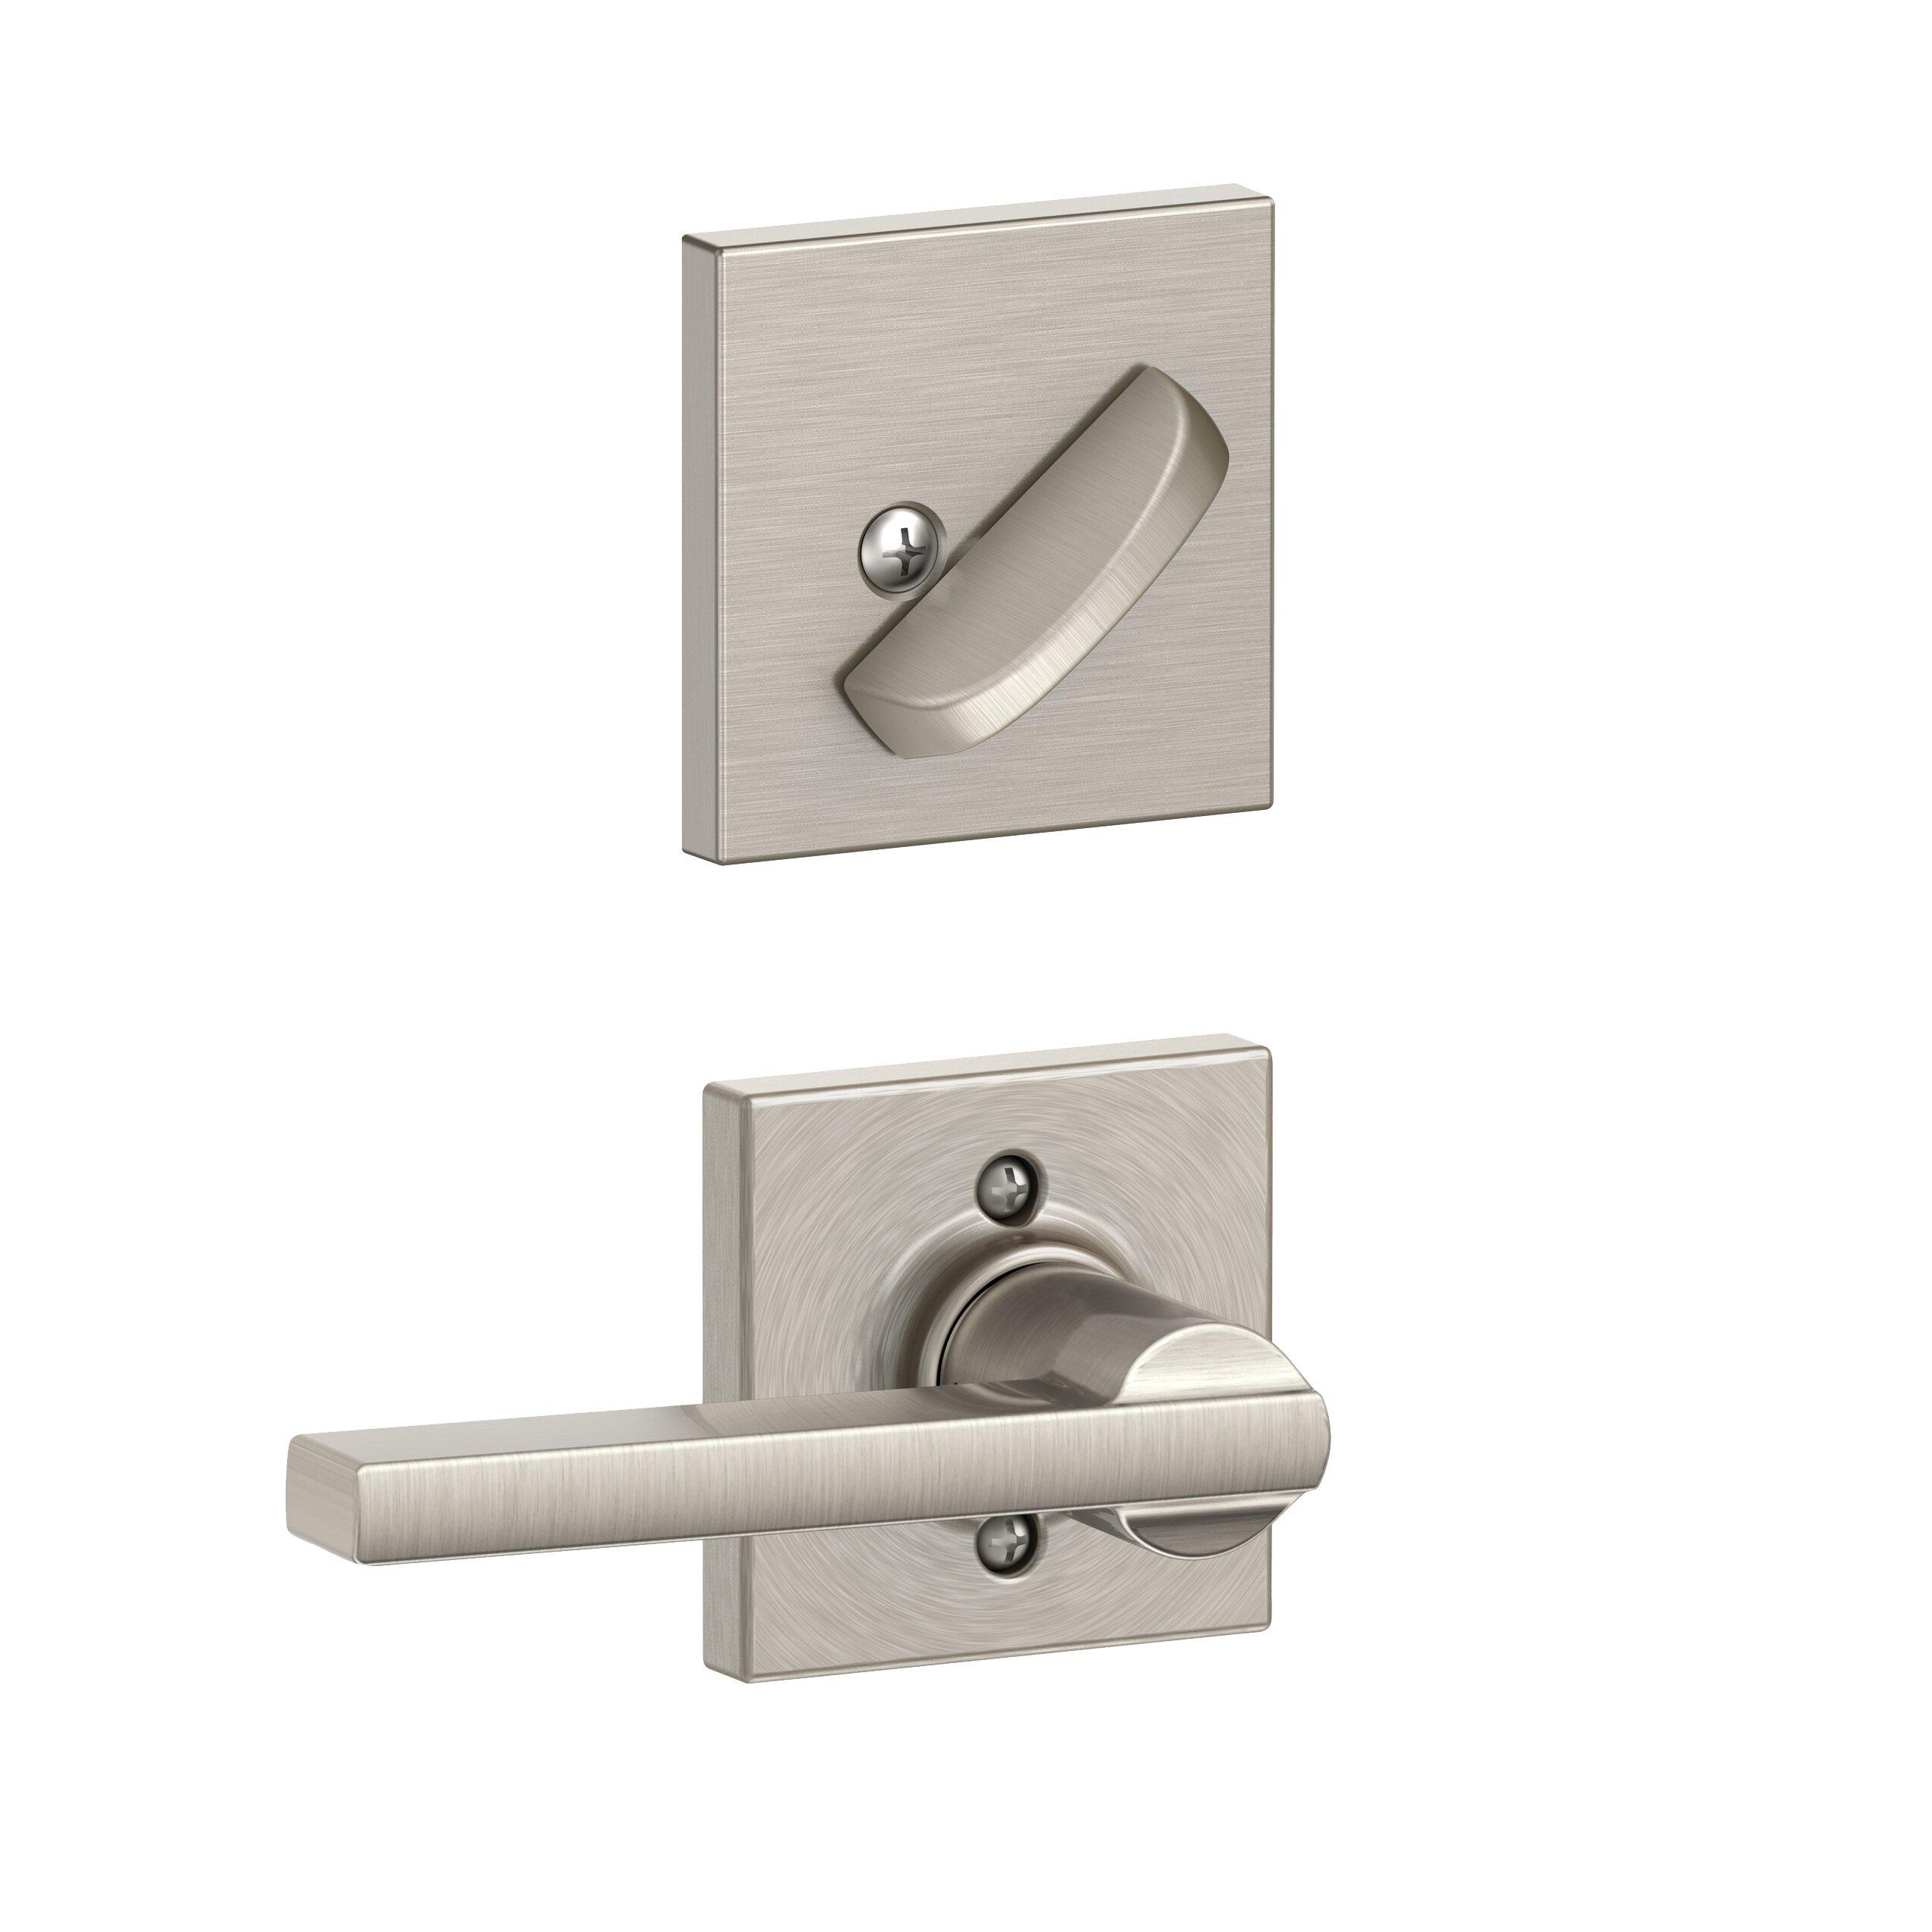 Schlage Latitude Single Cylinder Interior Lever Set Exterior Portion Sold Separately Wayfair